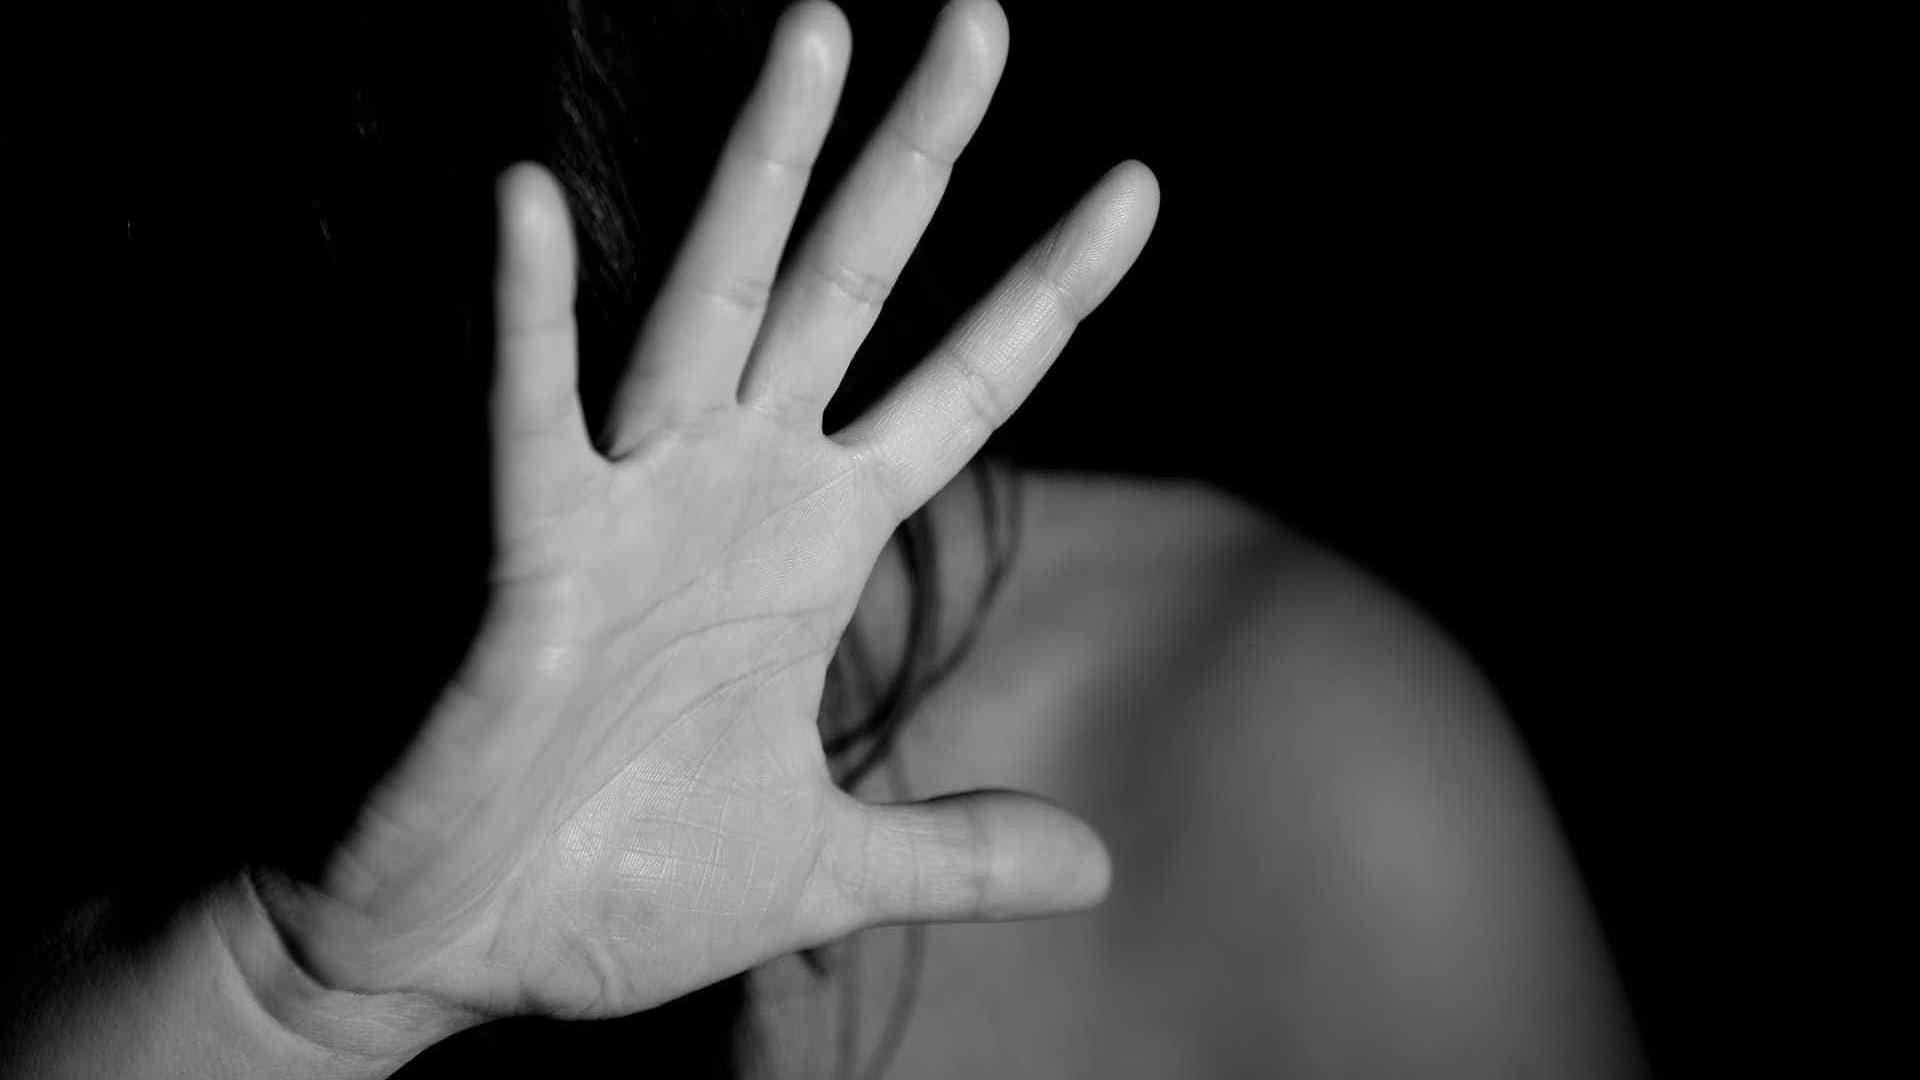 Adolescente de 16 anos é estuprada por médico durante consulta